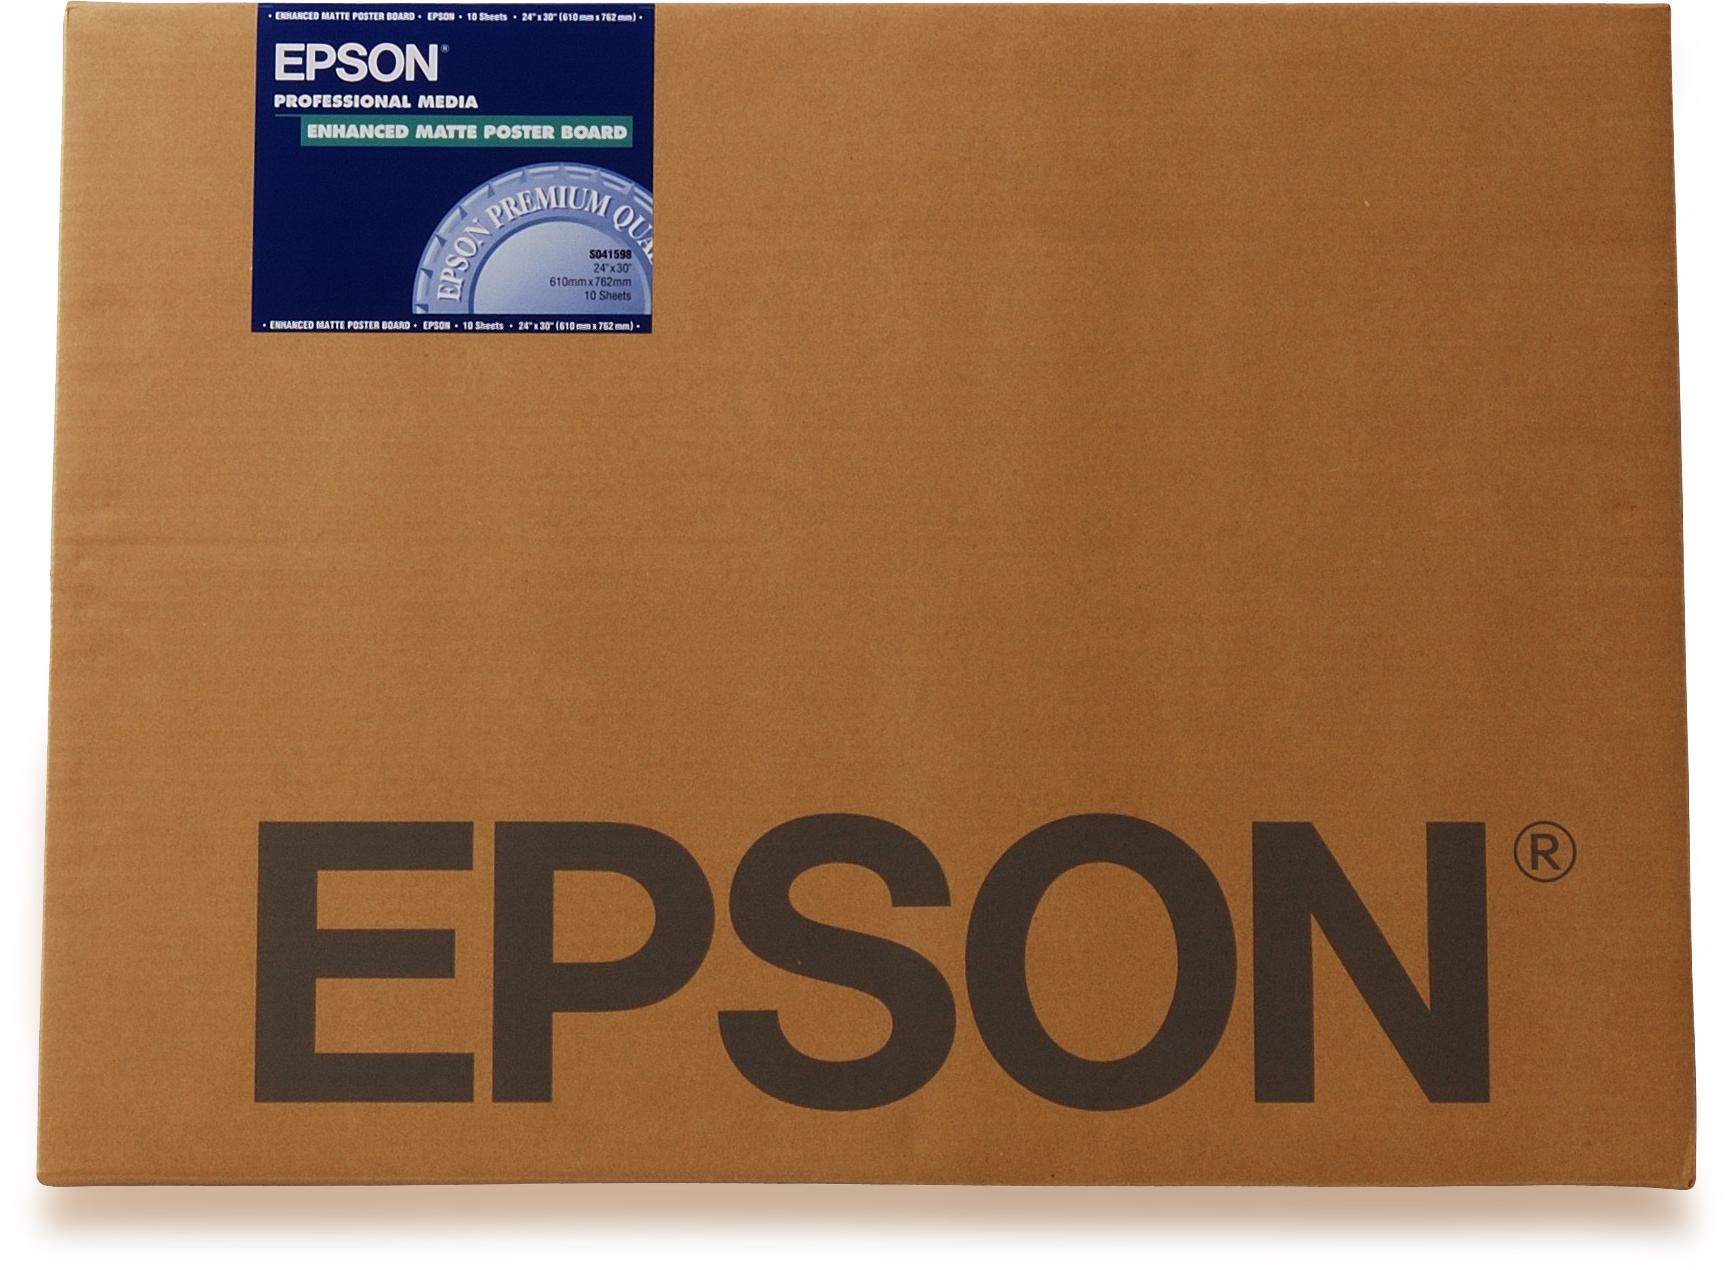 Epson Enhanced Matte Posterboard, DIN A3+, 800g/m², 20 Sheets